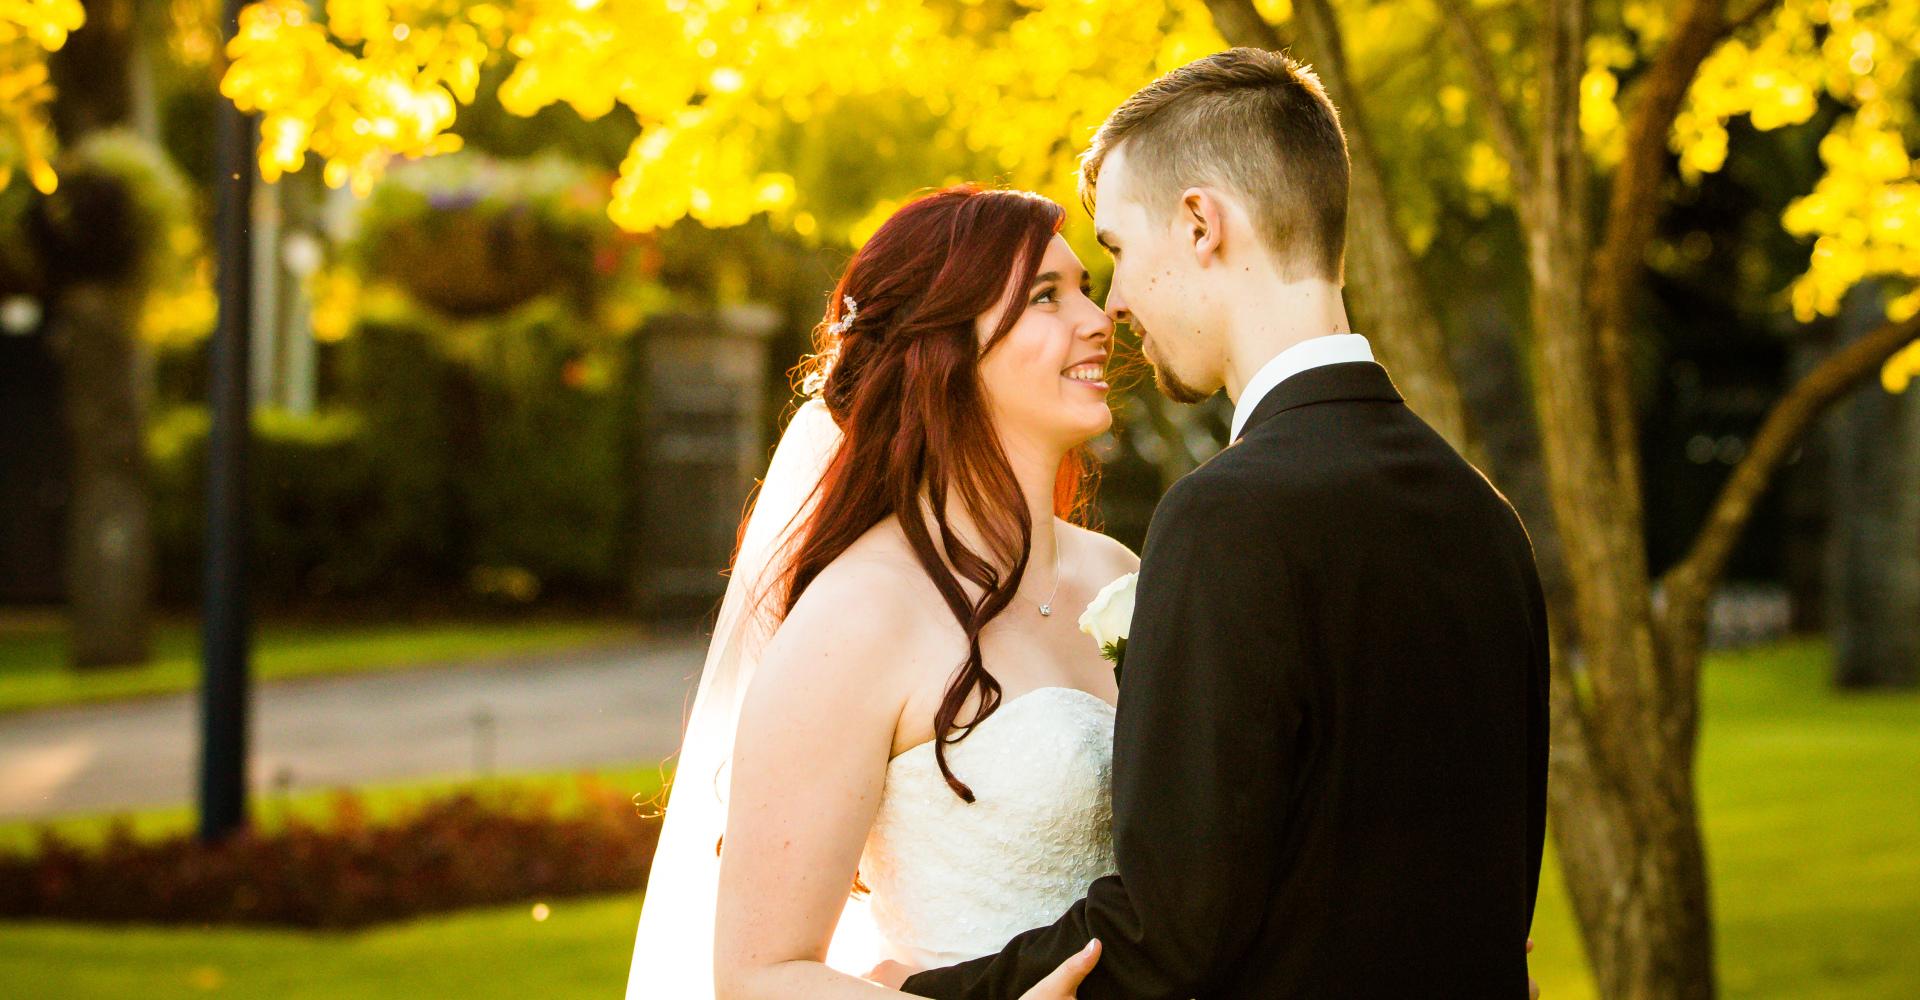 Aaron & Brittany   Laurel Bank Park   Toowoomba Wedding Photography